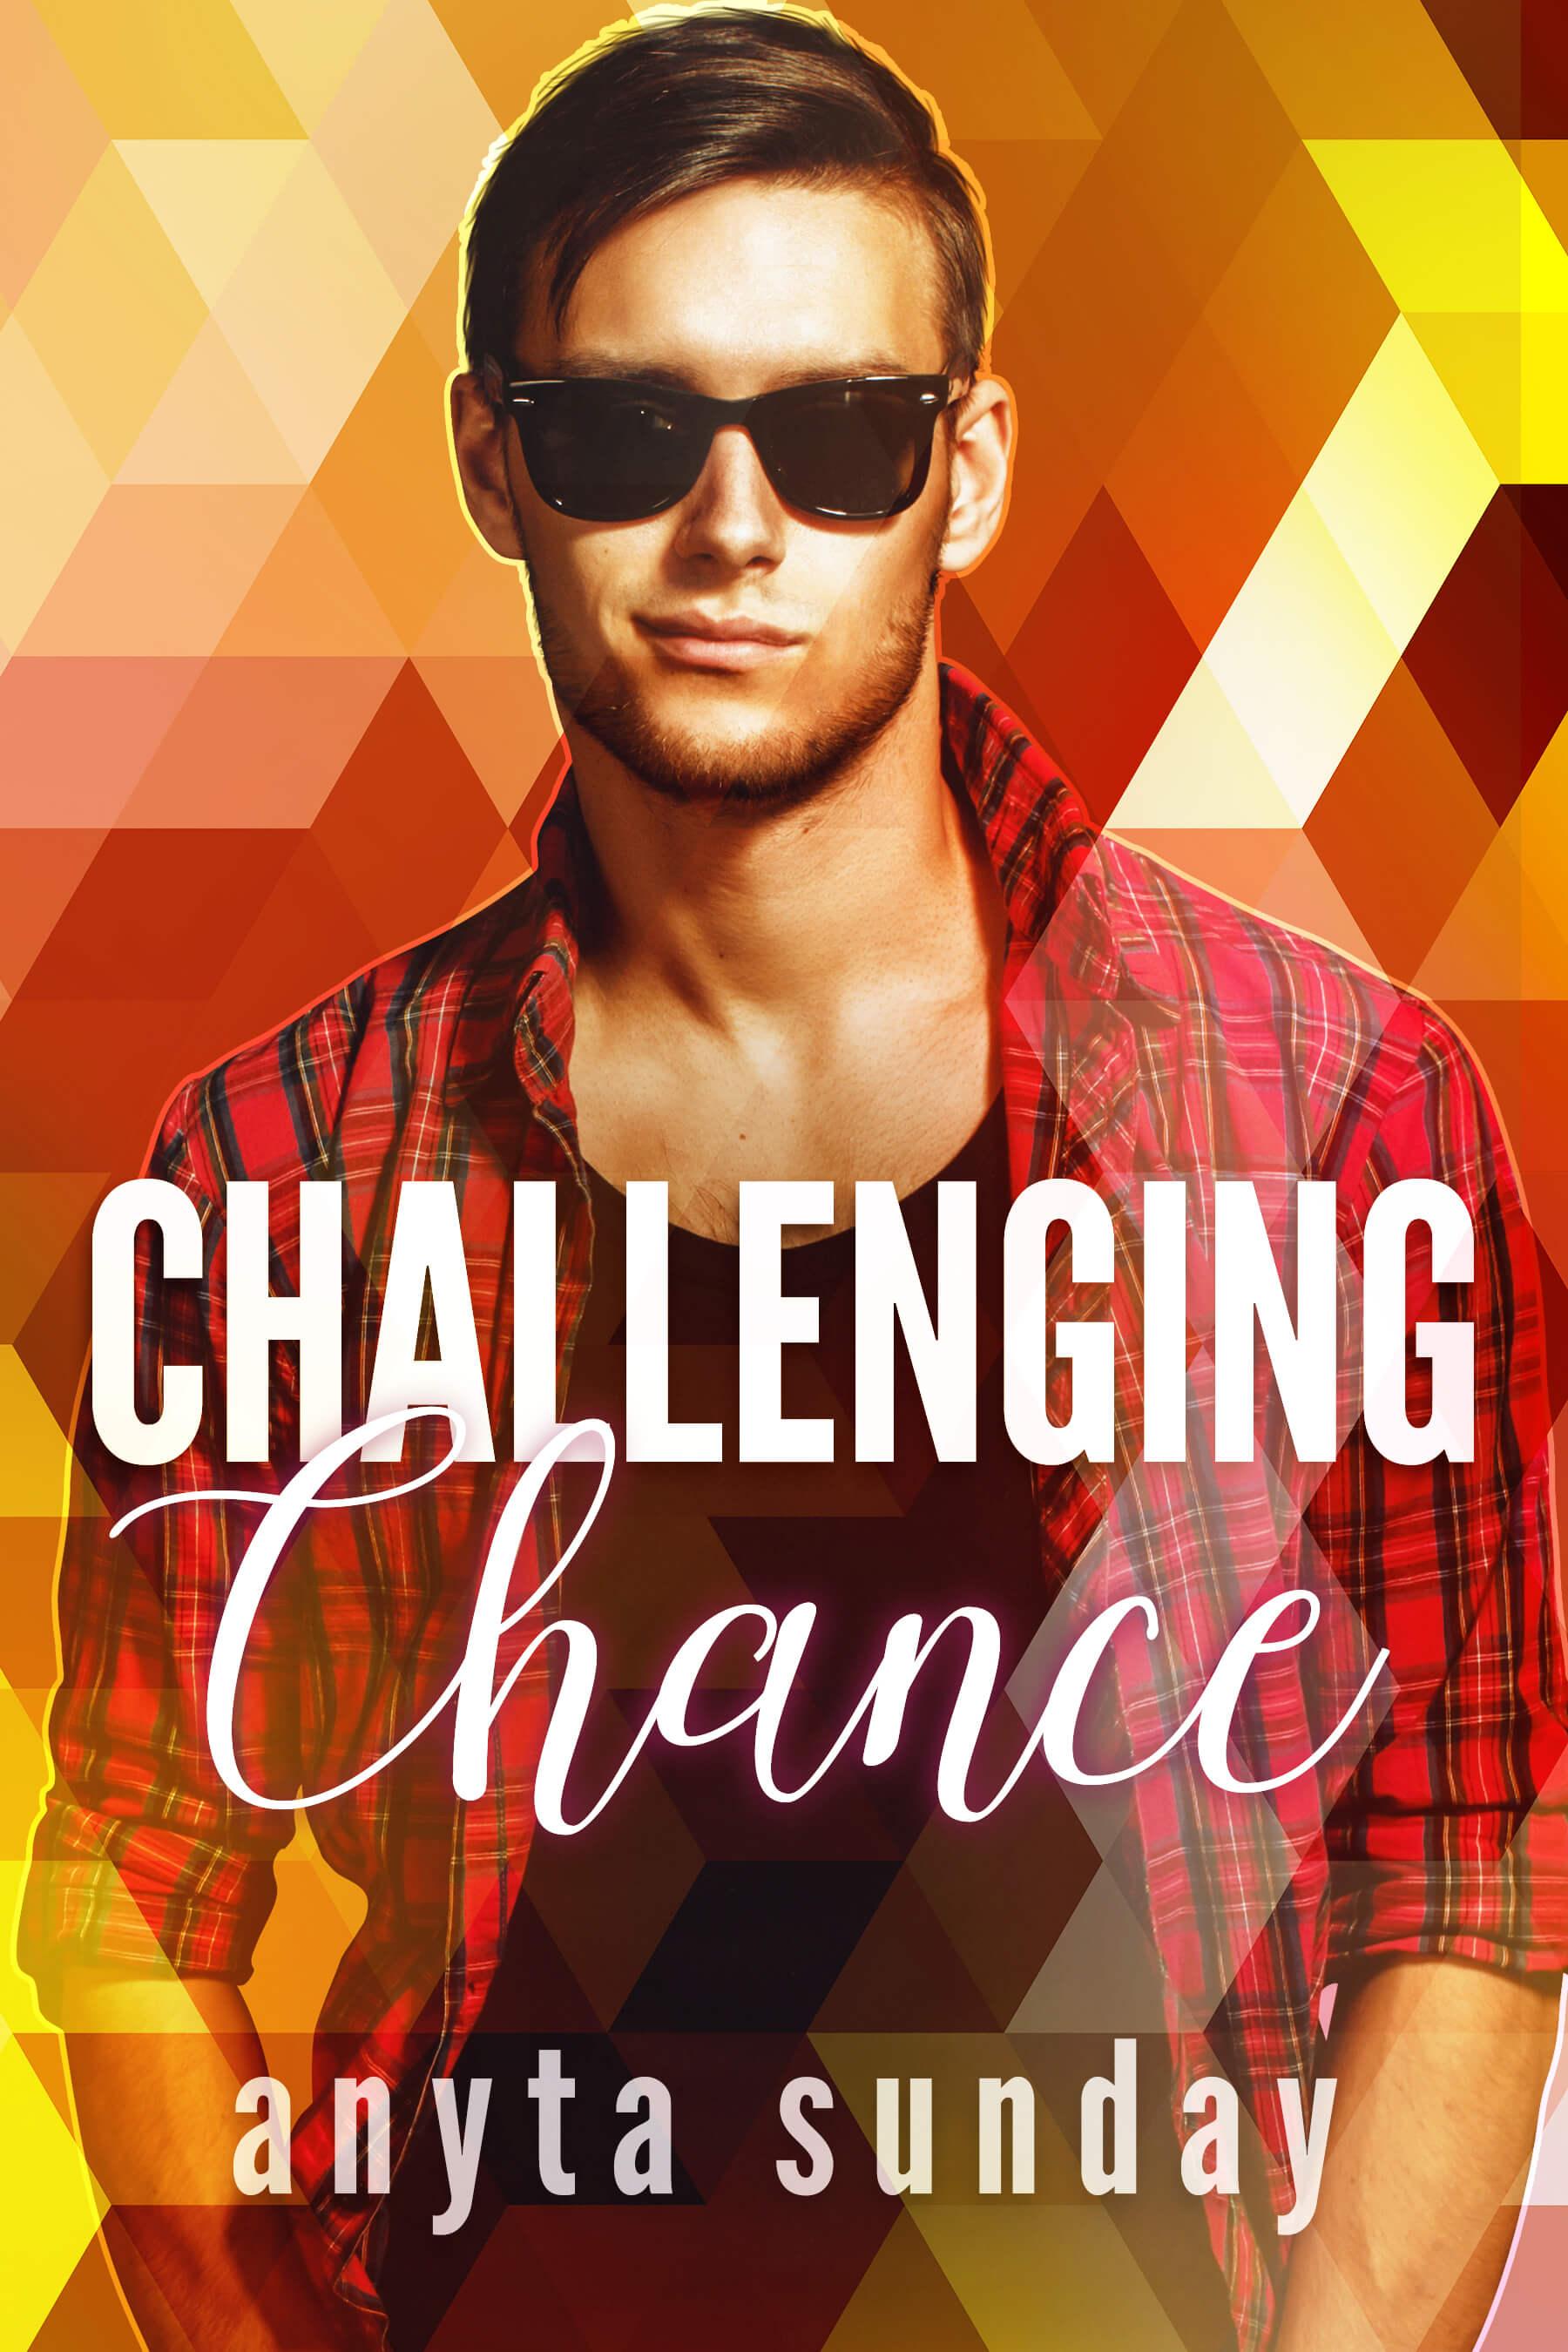 ChallengingChance-f.jpg